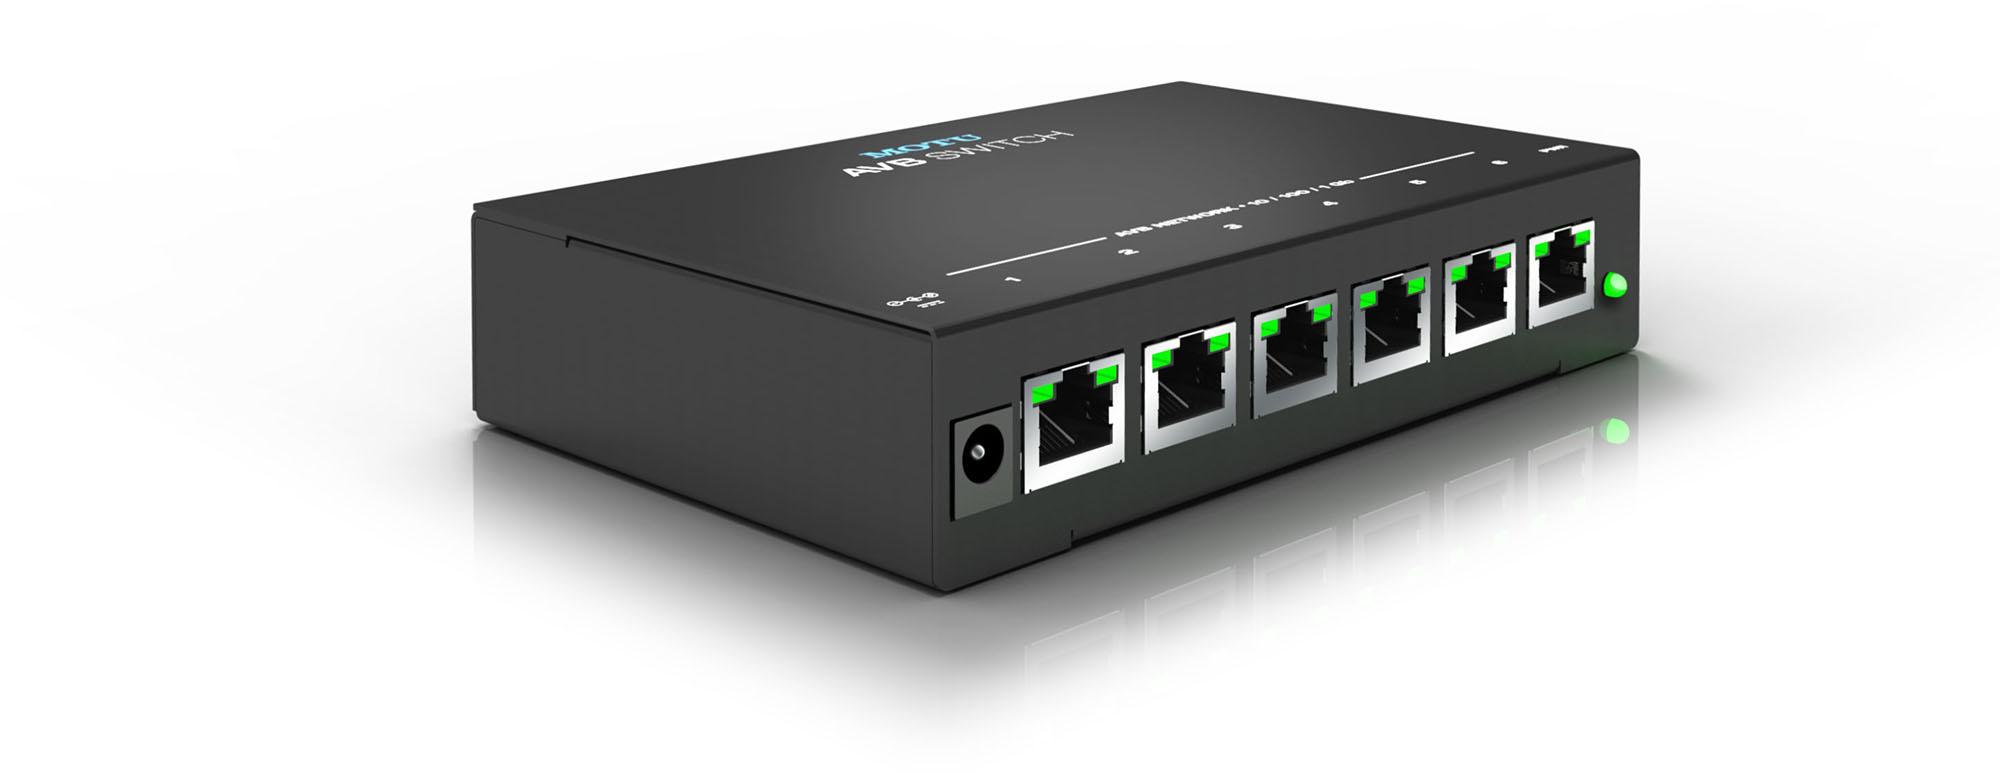 Motu Avb Switch Five Port Avb Ethernet Switch